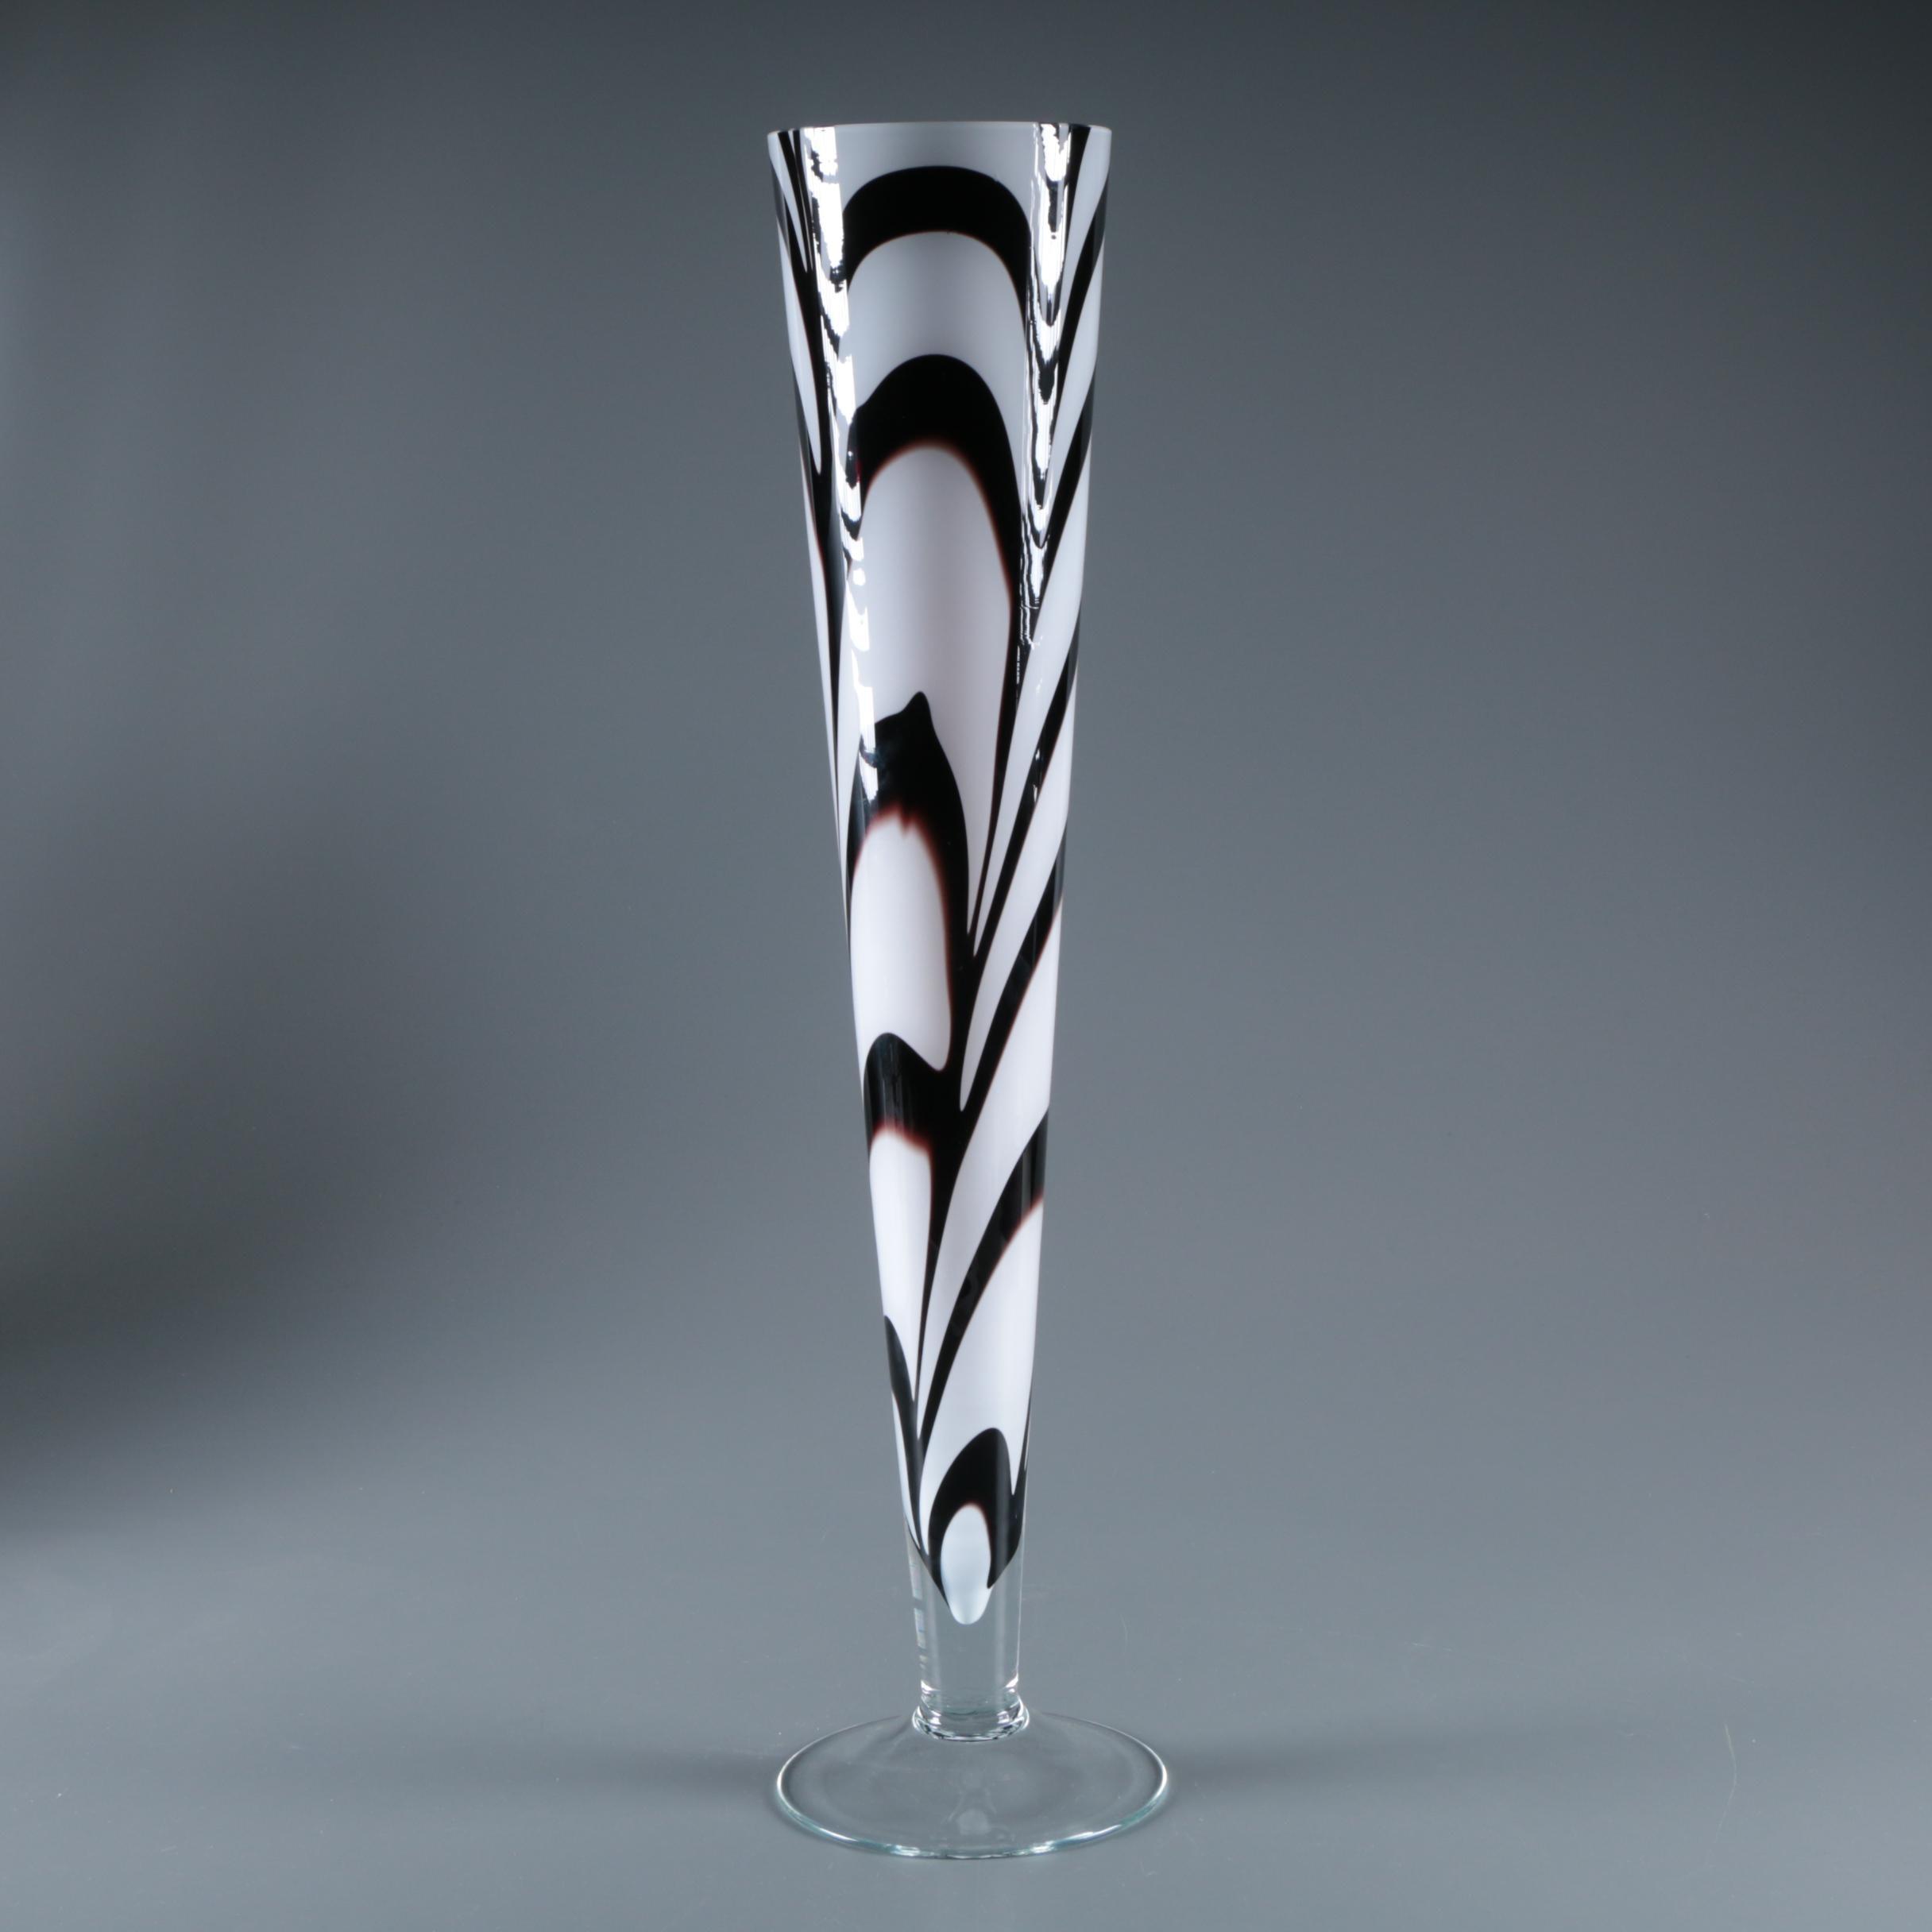 Makora Combed and Cased Blown Glass Trumpet Floor Vase